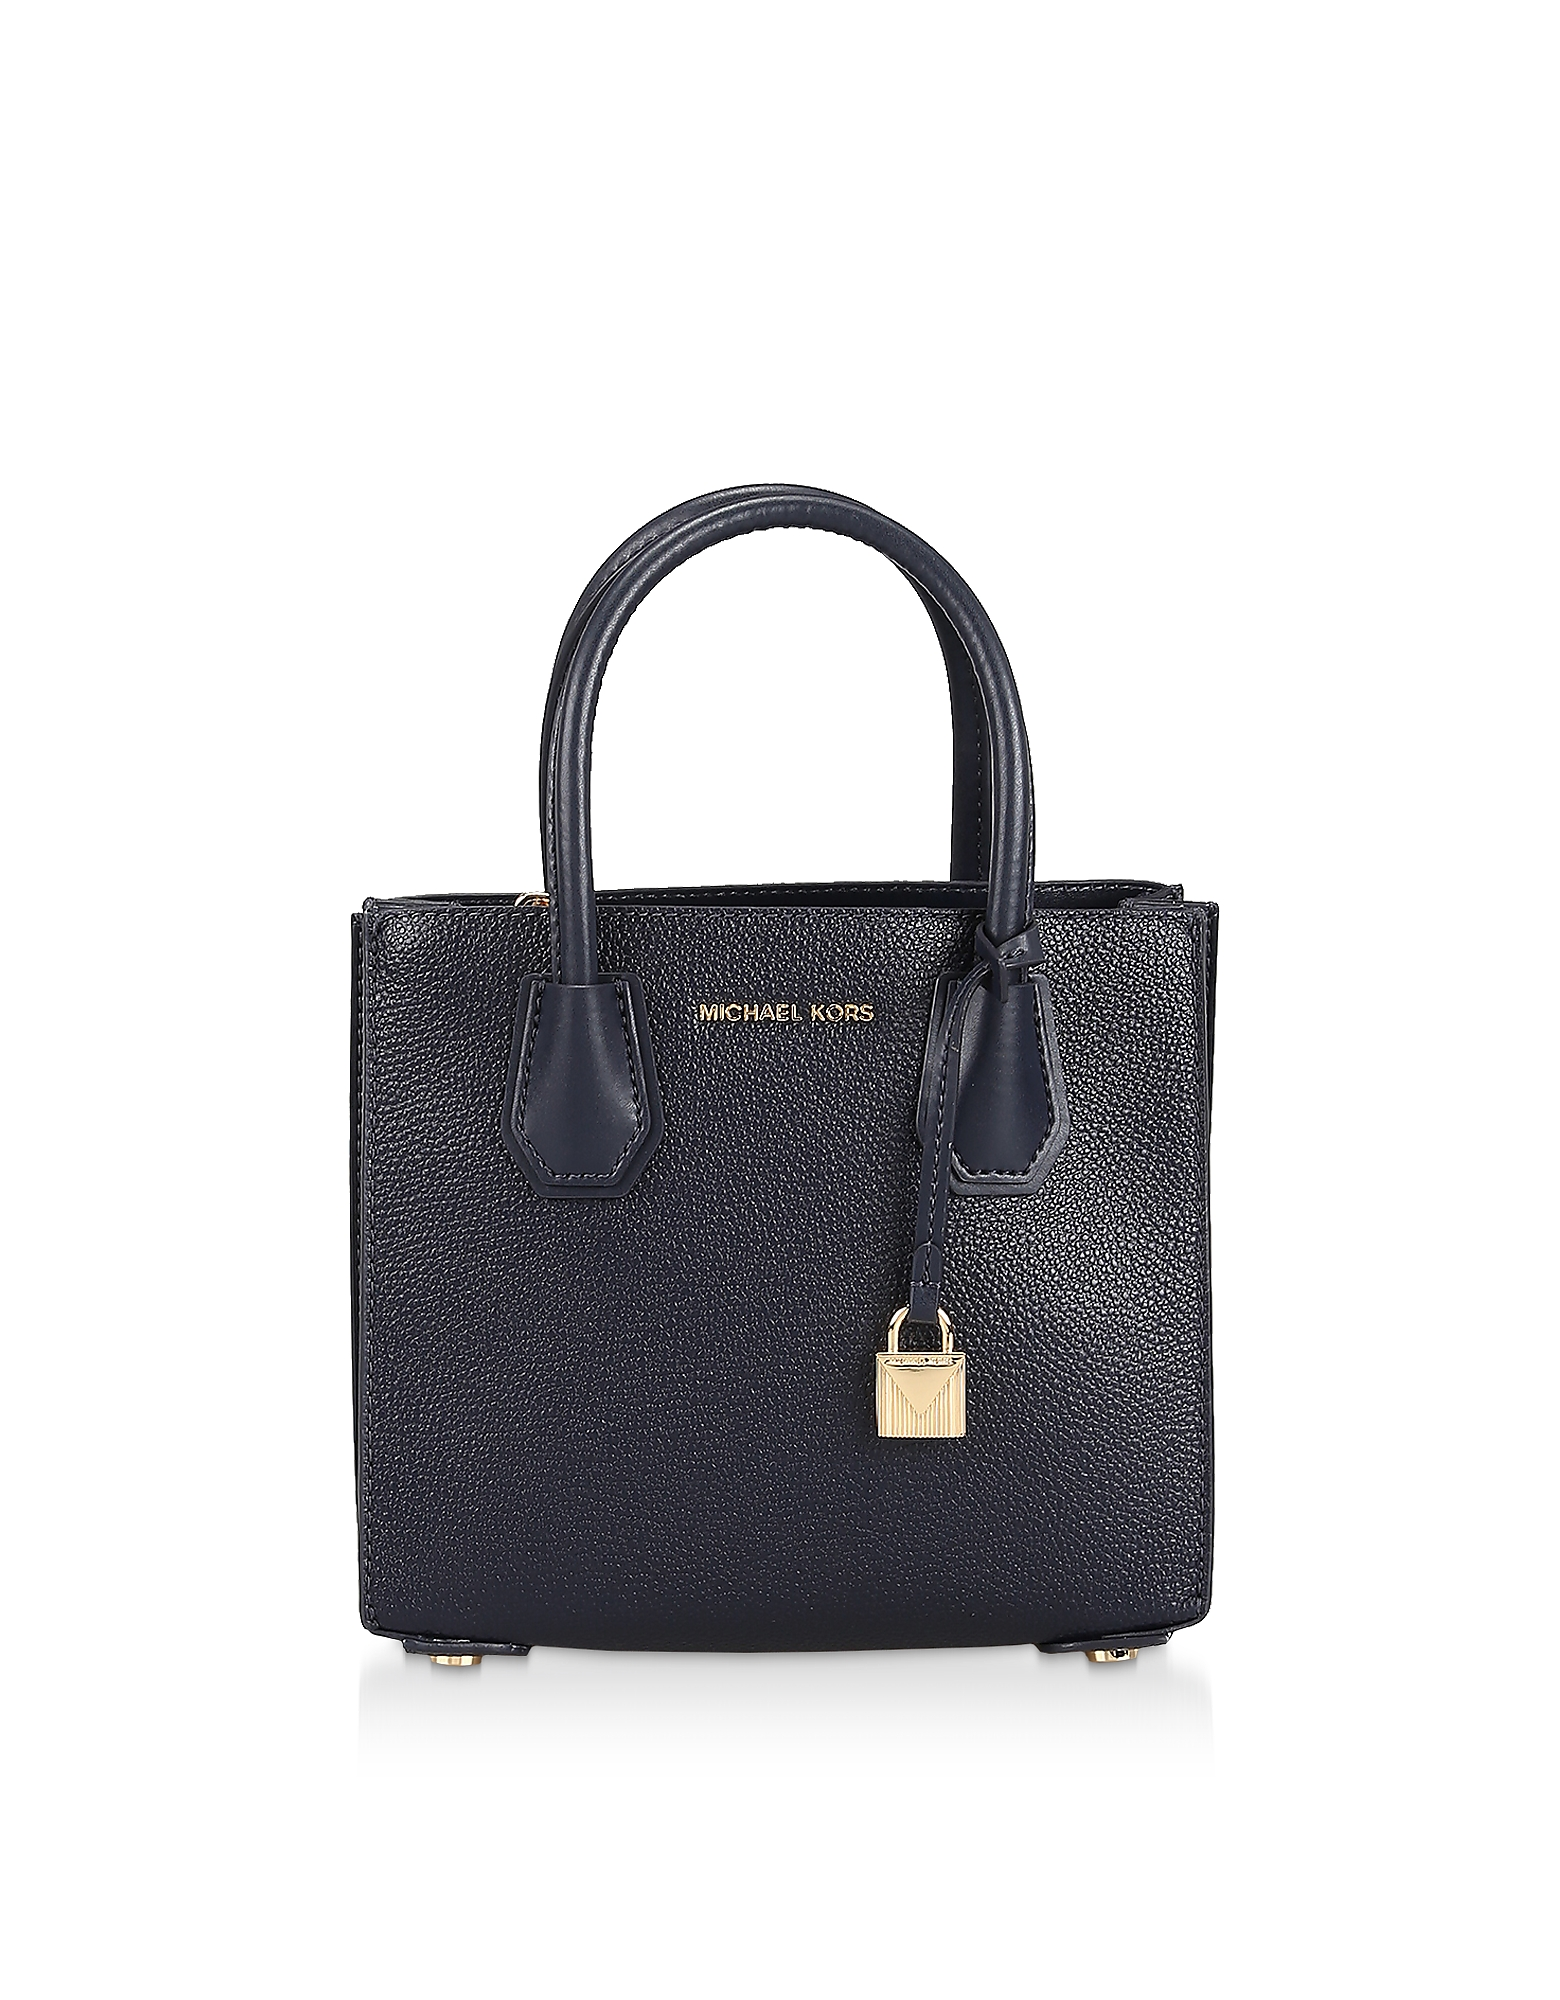 MICHAEL KORS | Michael Kors Designer Handbags, Mercer Medium Messenger Bag | Goxip